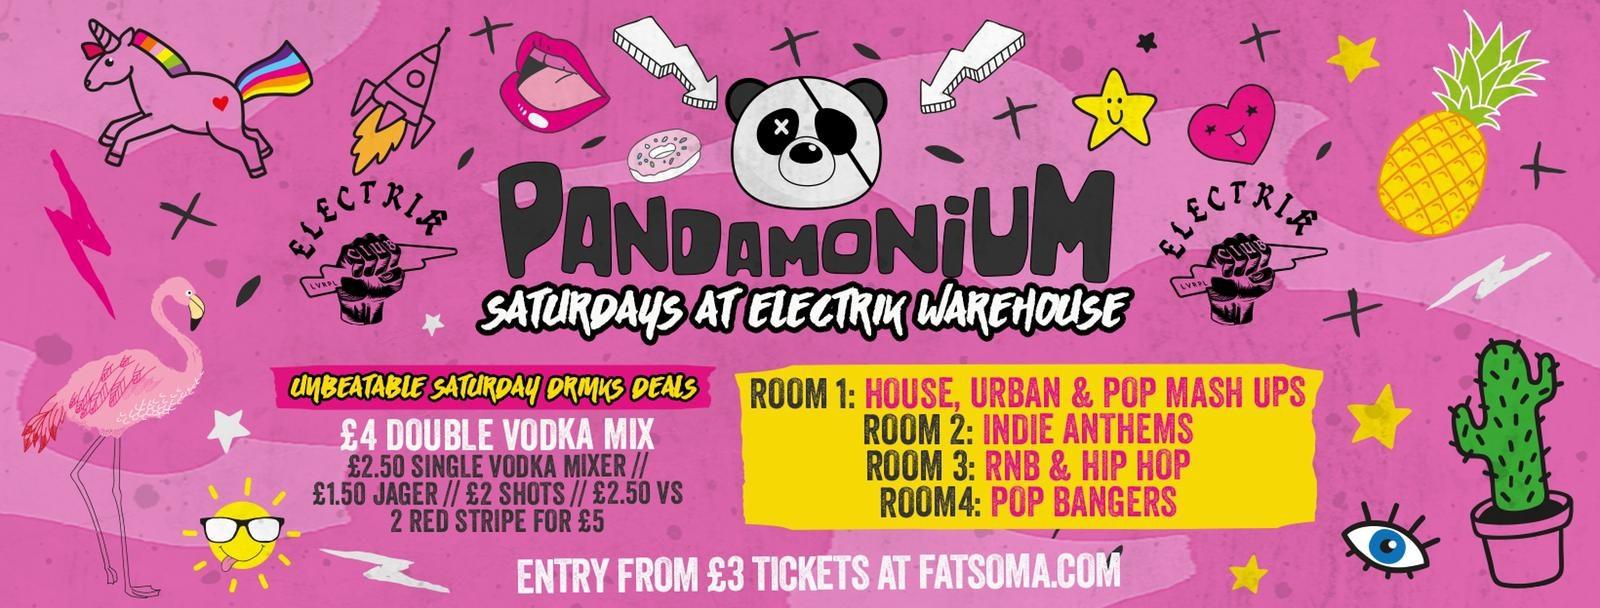 Pandamonium Saturdays